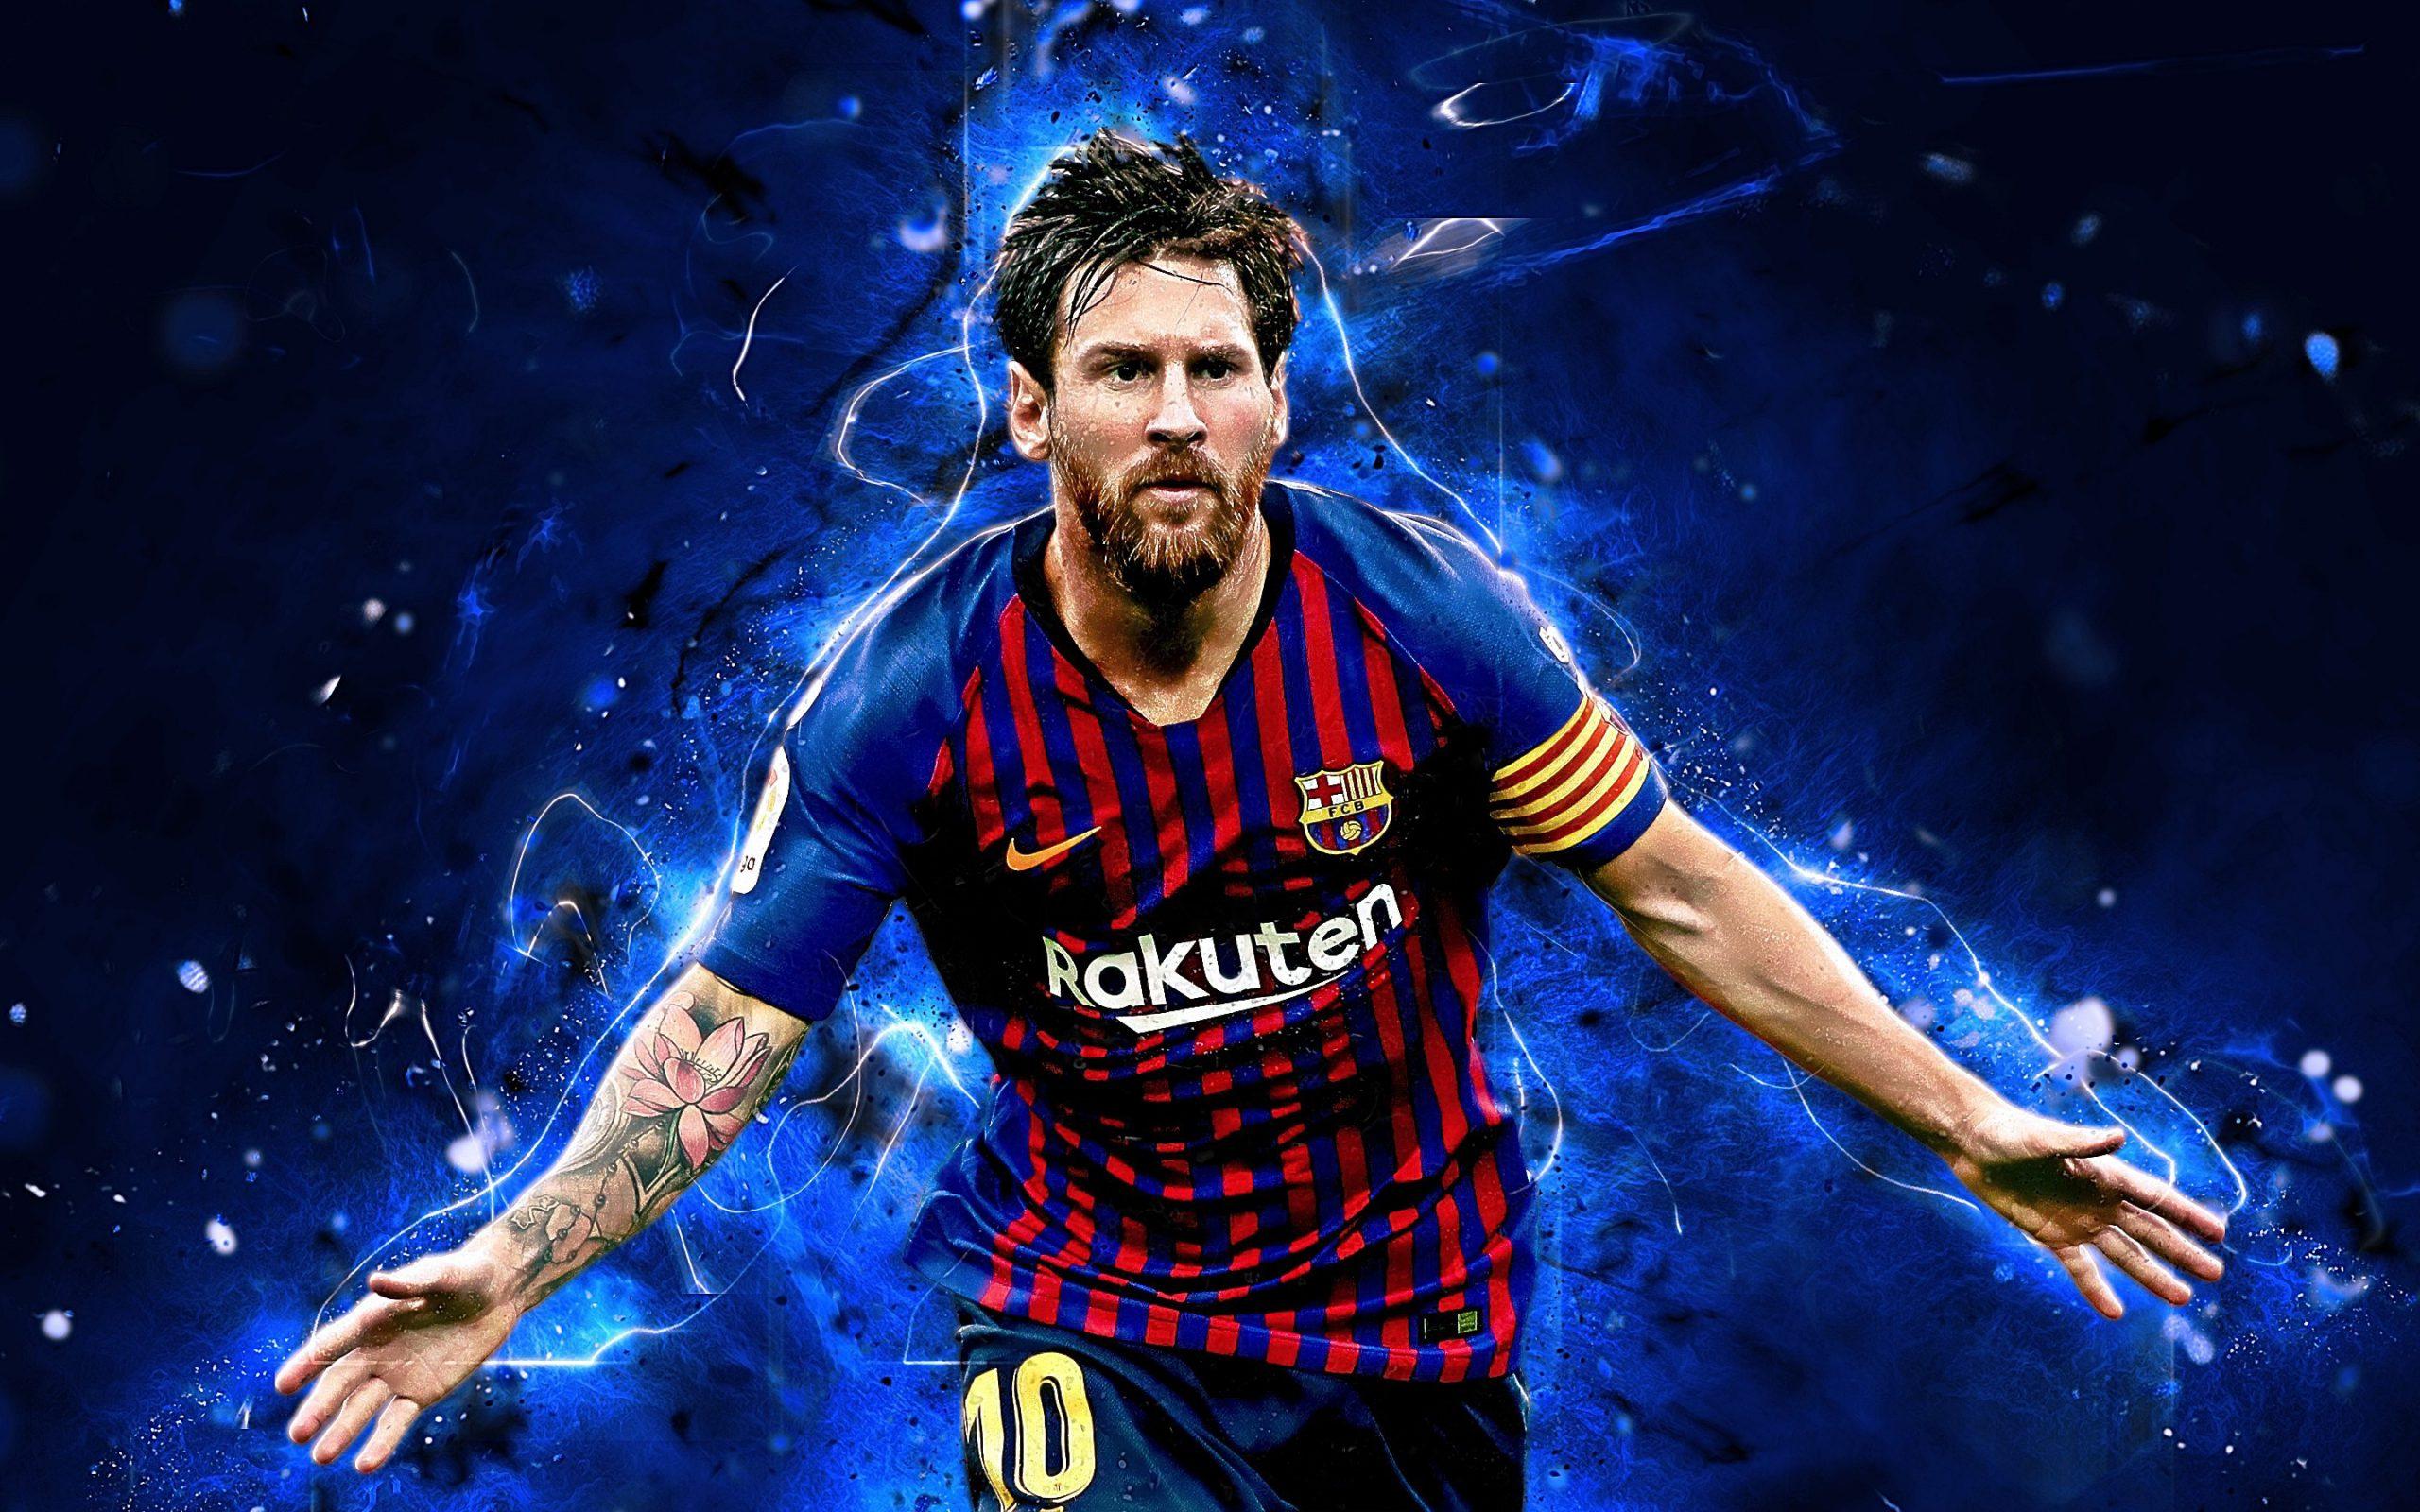 Messi Power Wallpaper Kolpaper Awesome Free Hd Wallpapers